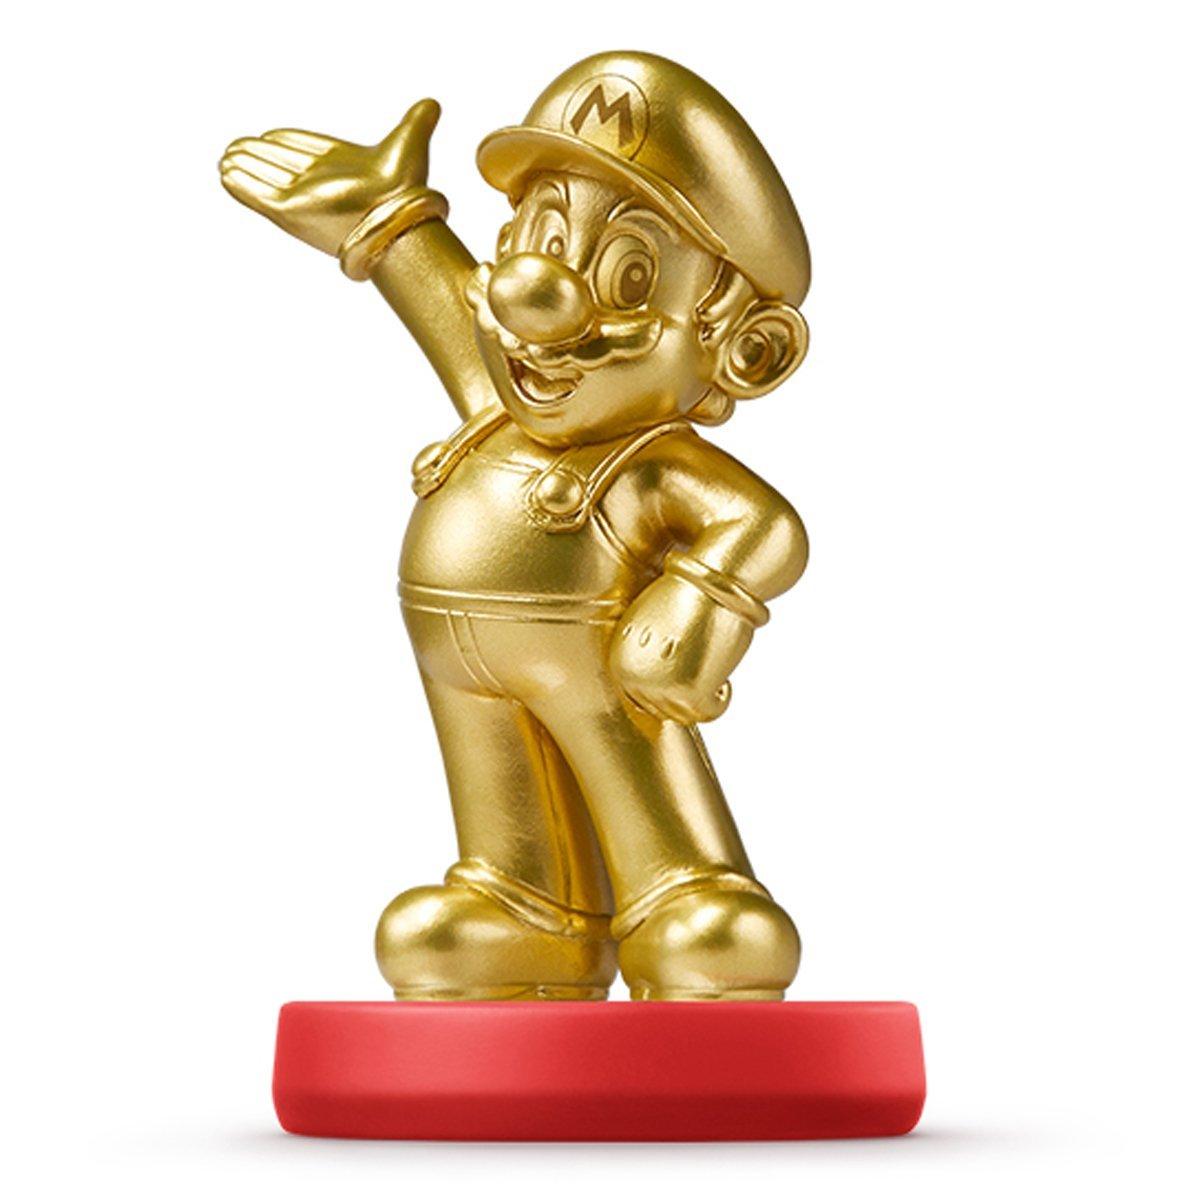 Amiibo Mario Gold Ver. 黃金馬莉歐 黃金馬力歐 無敵狀態  互動 Wii U/New3DS/New3DS LL 公仔 超級瑪莉系列